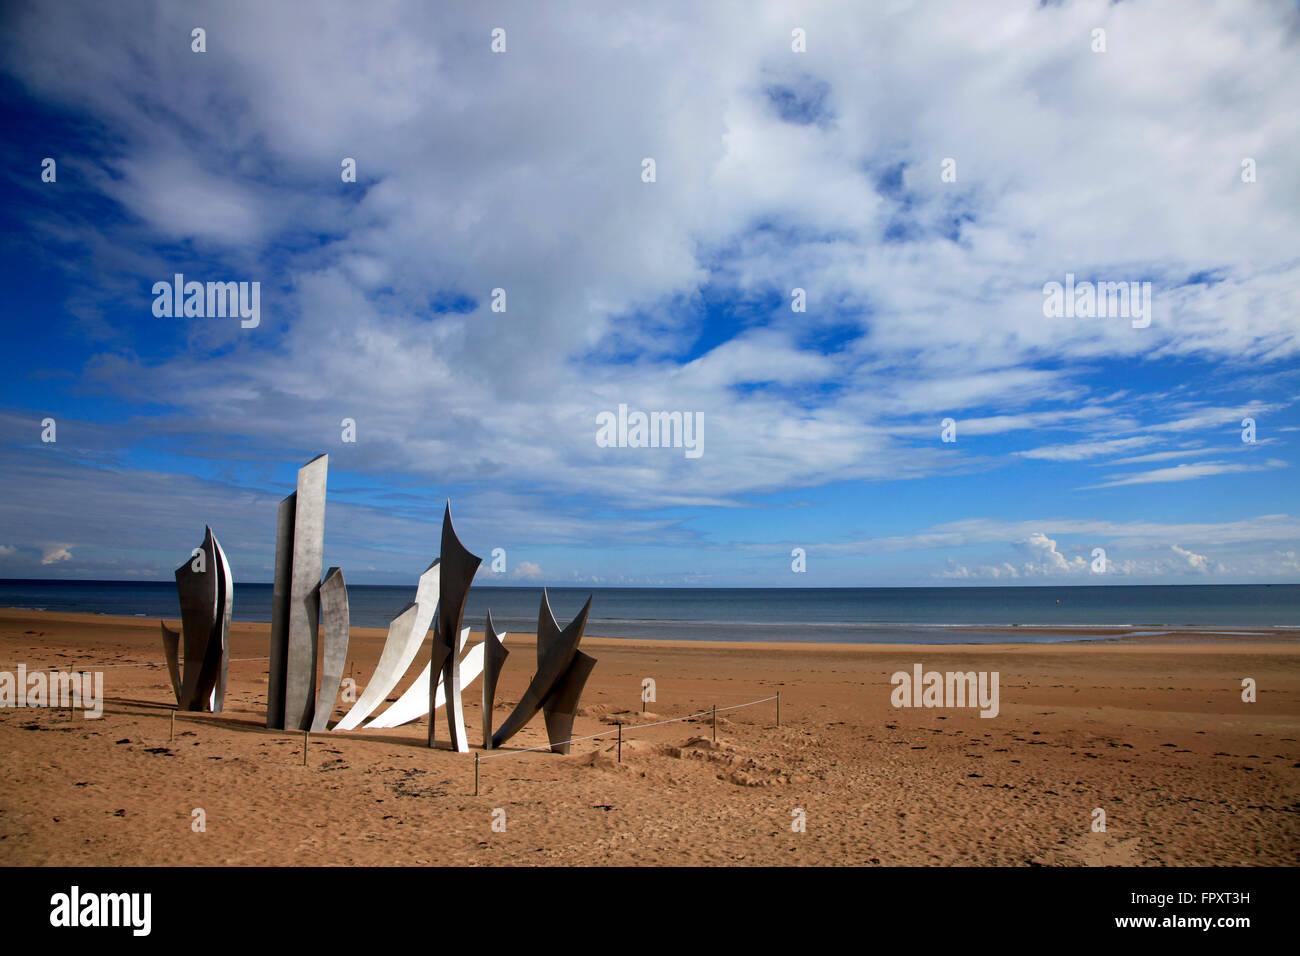 Omaha Beach, Normandy, France - Stock Image